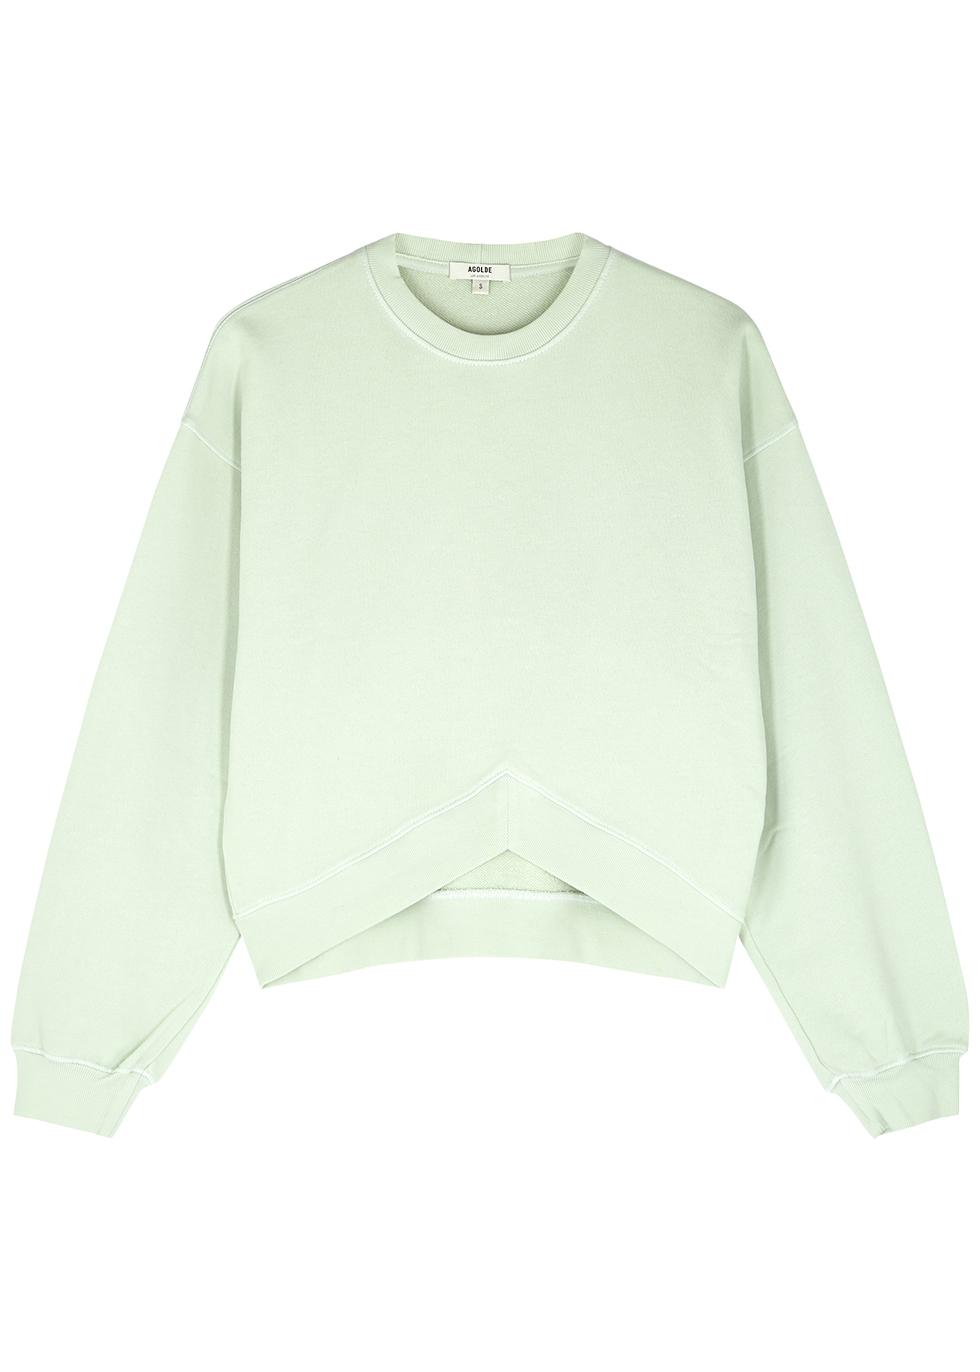 Mint green cotton sweatshirt